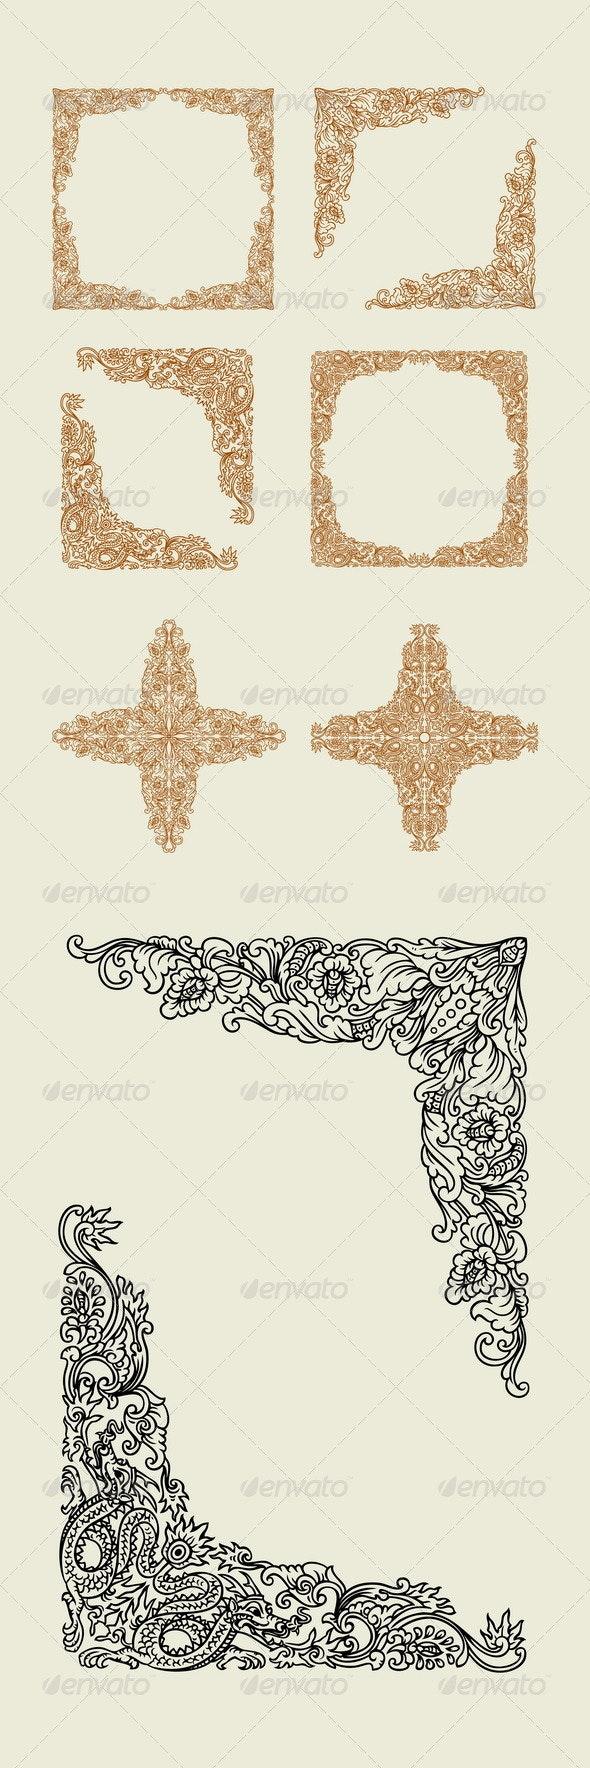 Dragon and Floral Decoration - Flourishes / Swirls Decorative